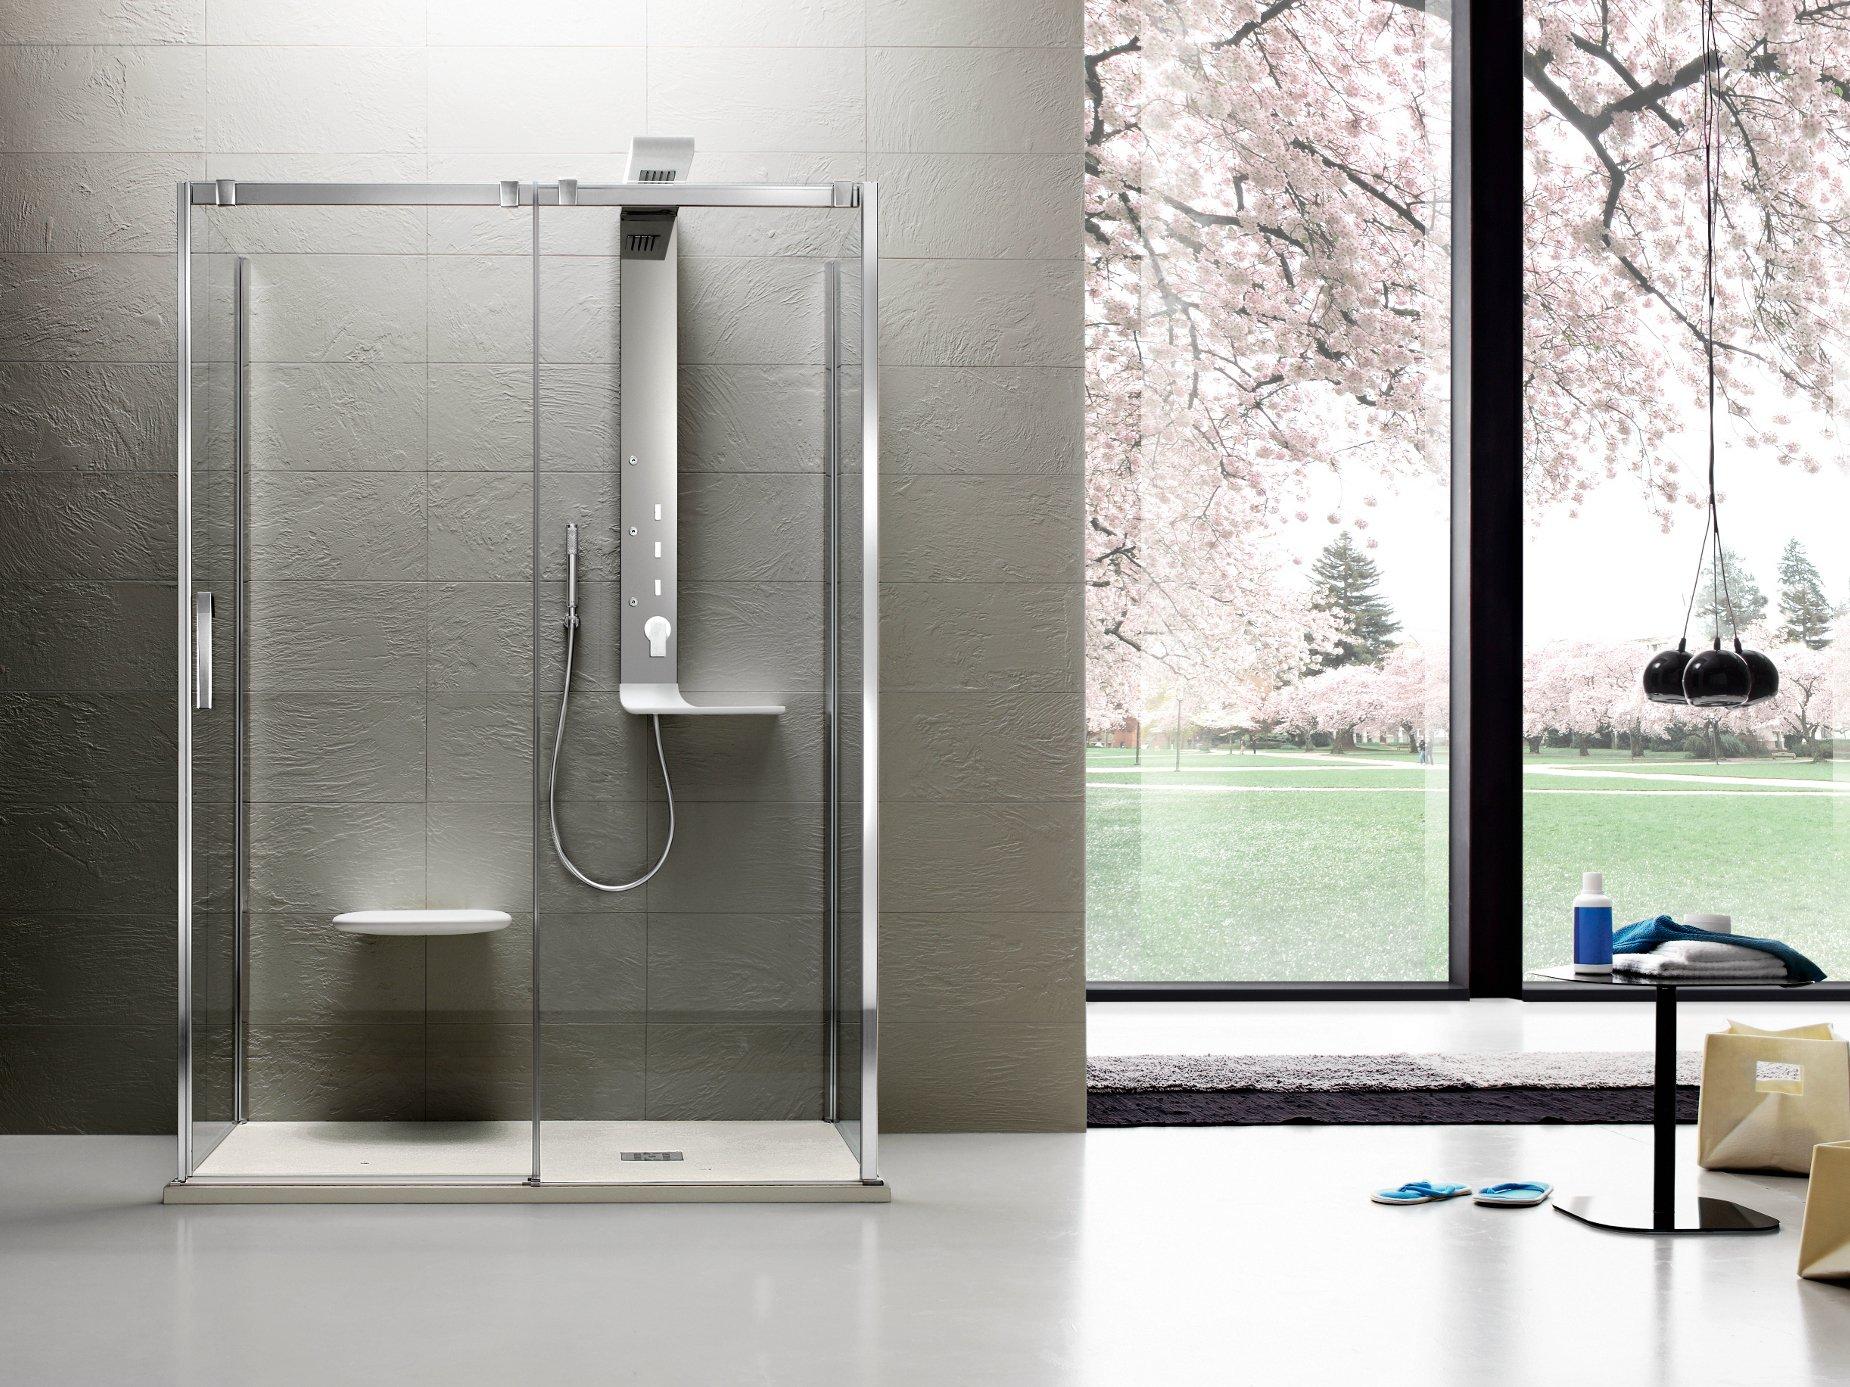 box doccia pavimento parquet rivestimento ceramica piastrelle arredo bagno